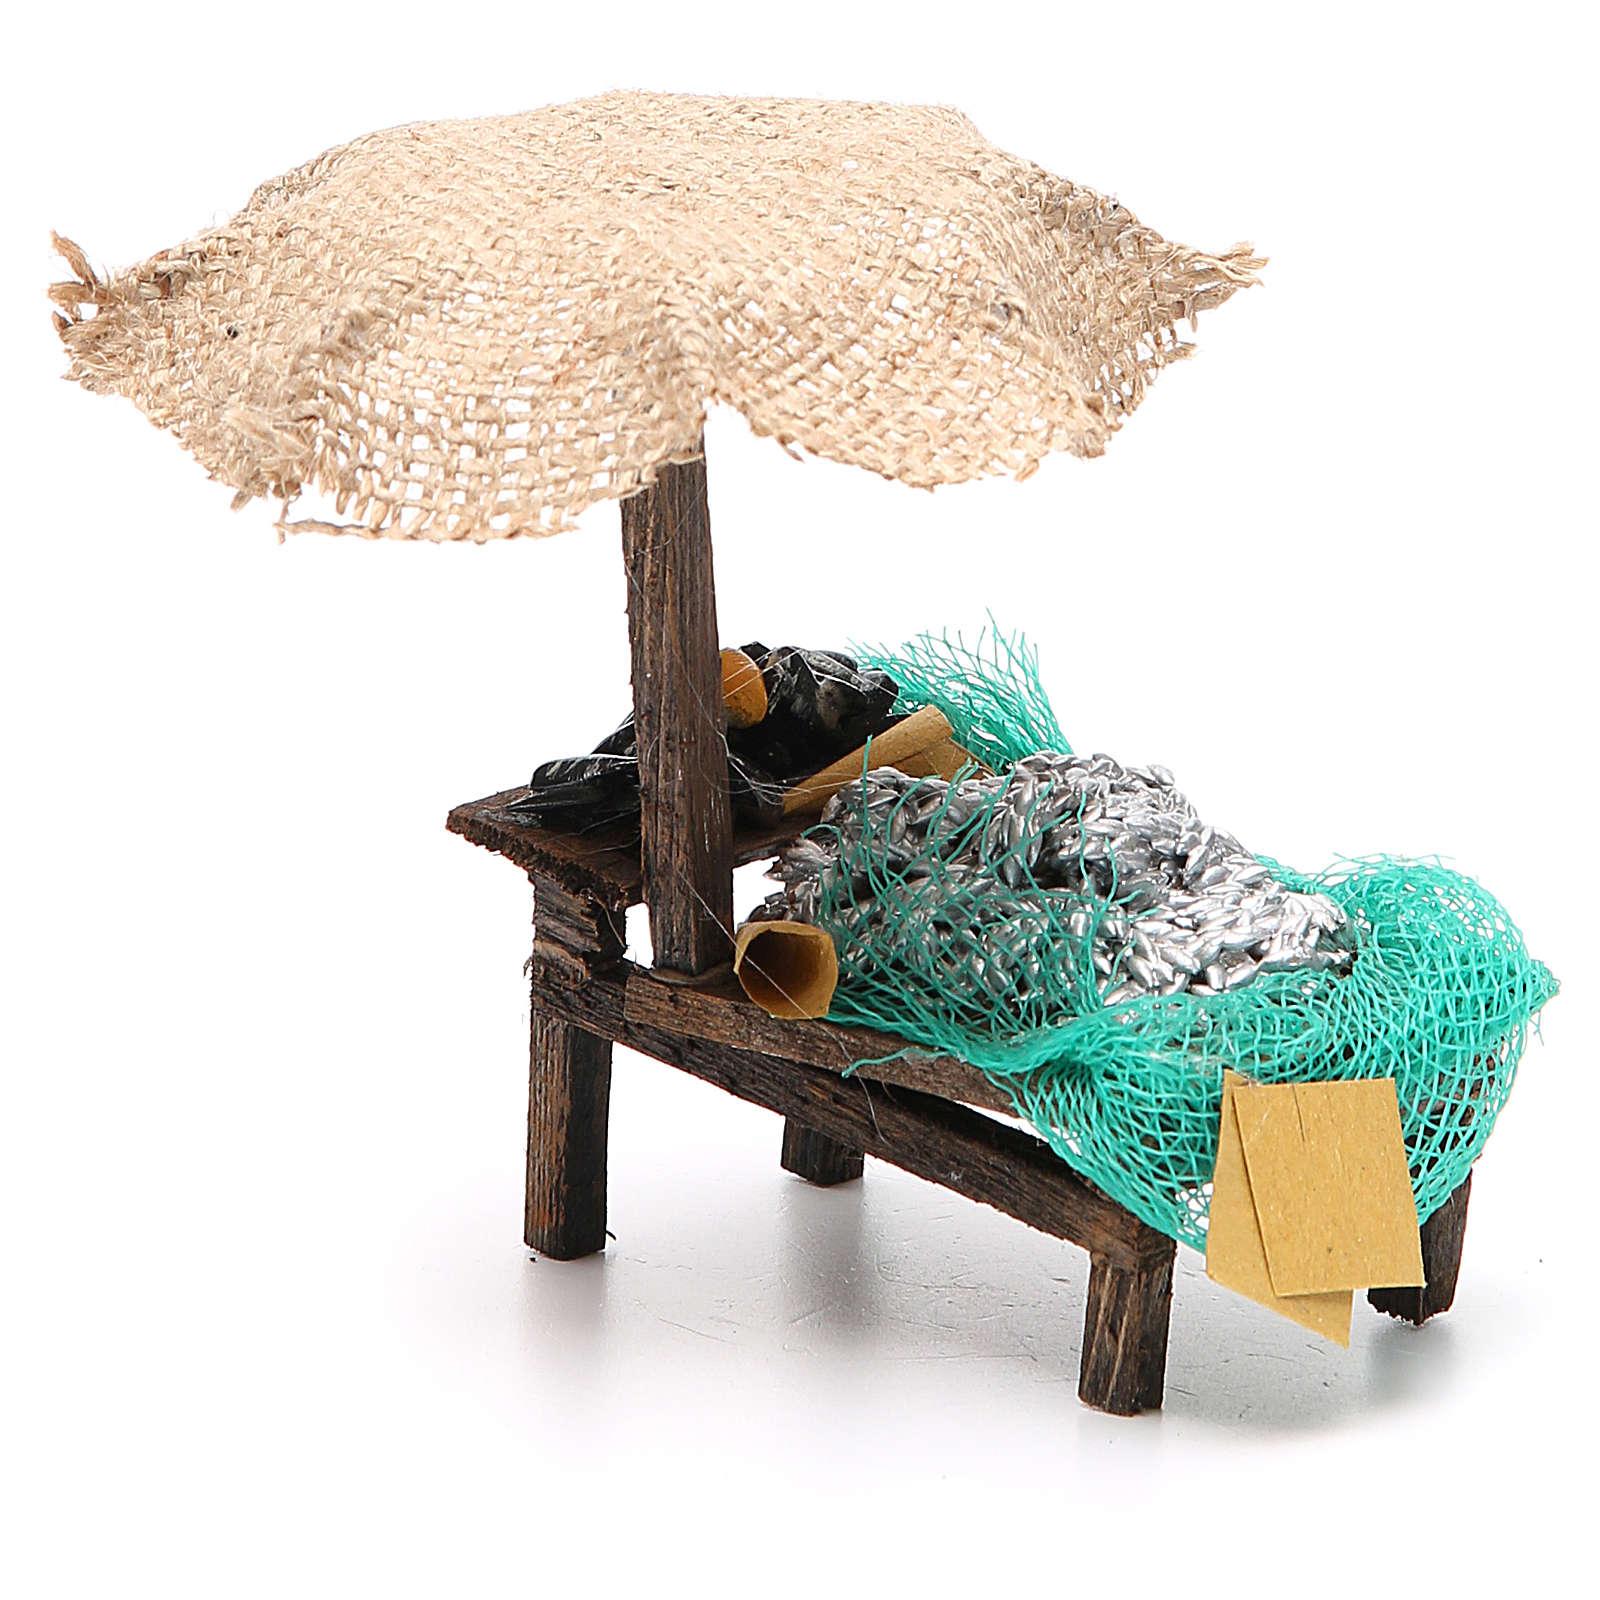 Workshop nativity with beach umbrella, sardine and mussels 12x10x12cm 4